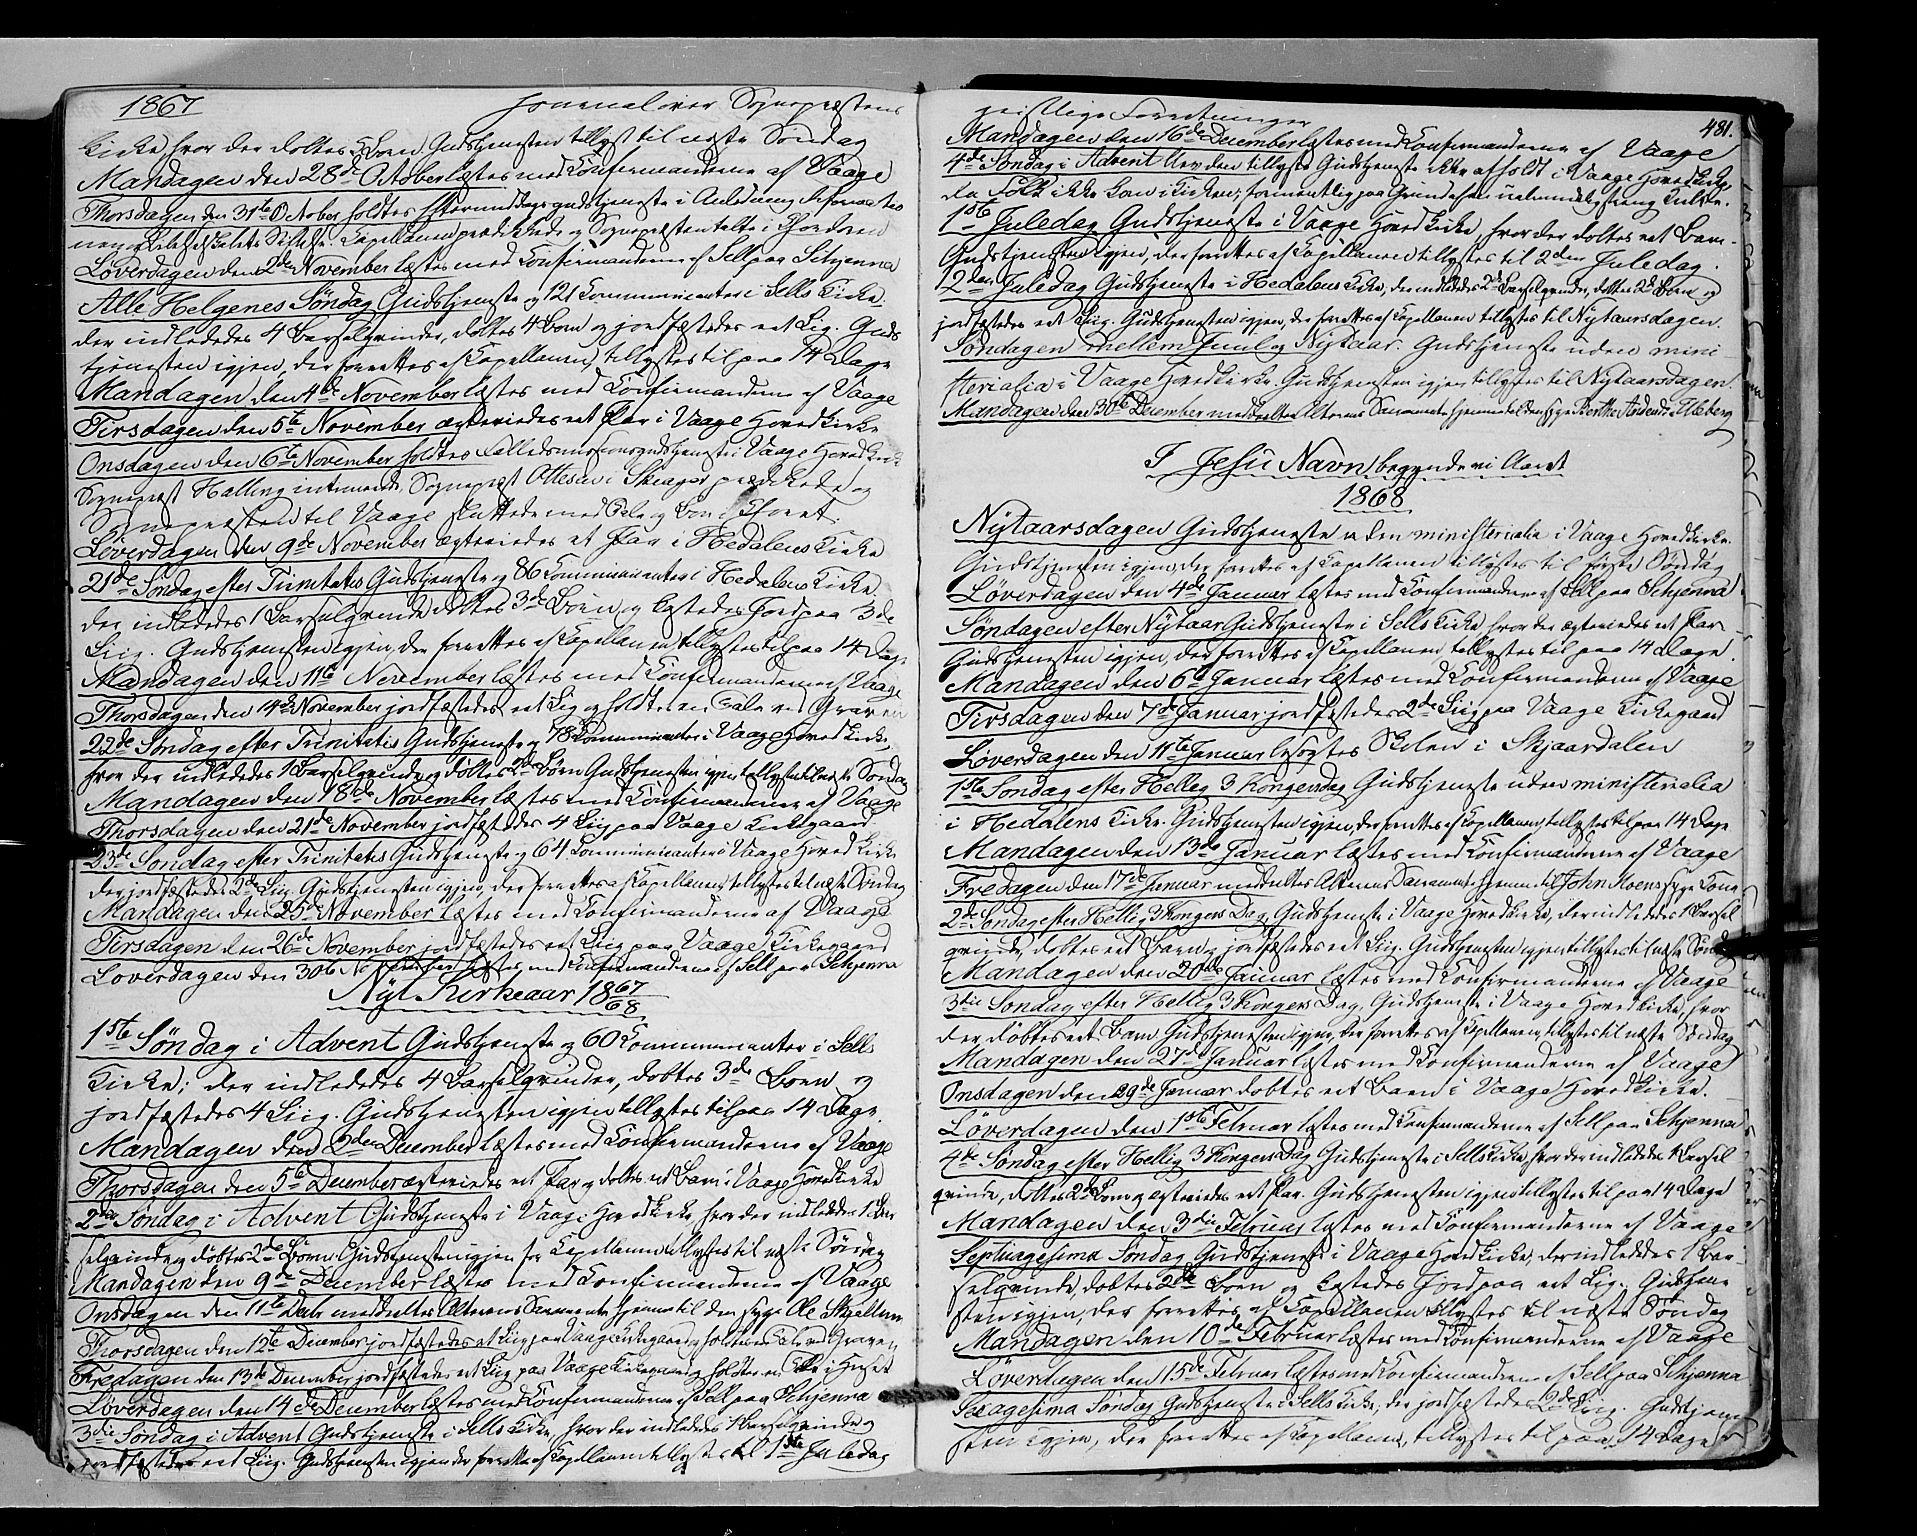 SAH, Vågå prestekontor, Ministerialbok nr. 6 /1, 1856-1872, s. 481